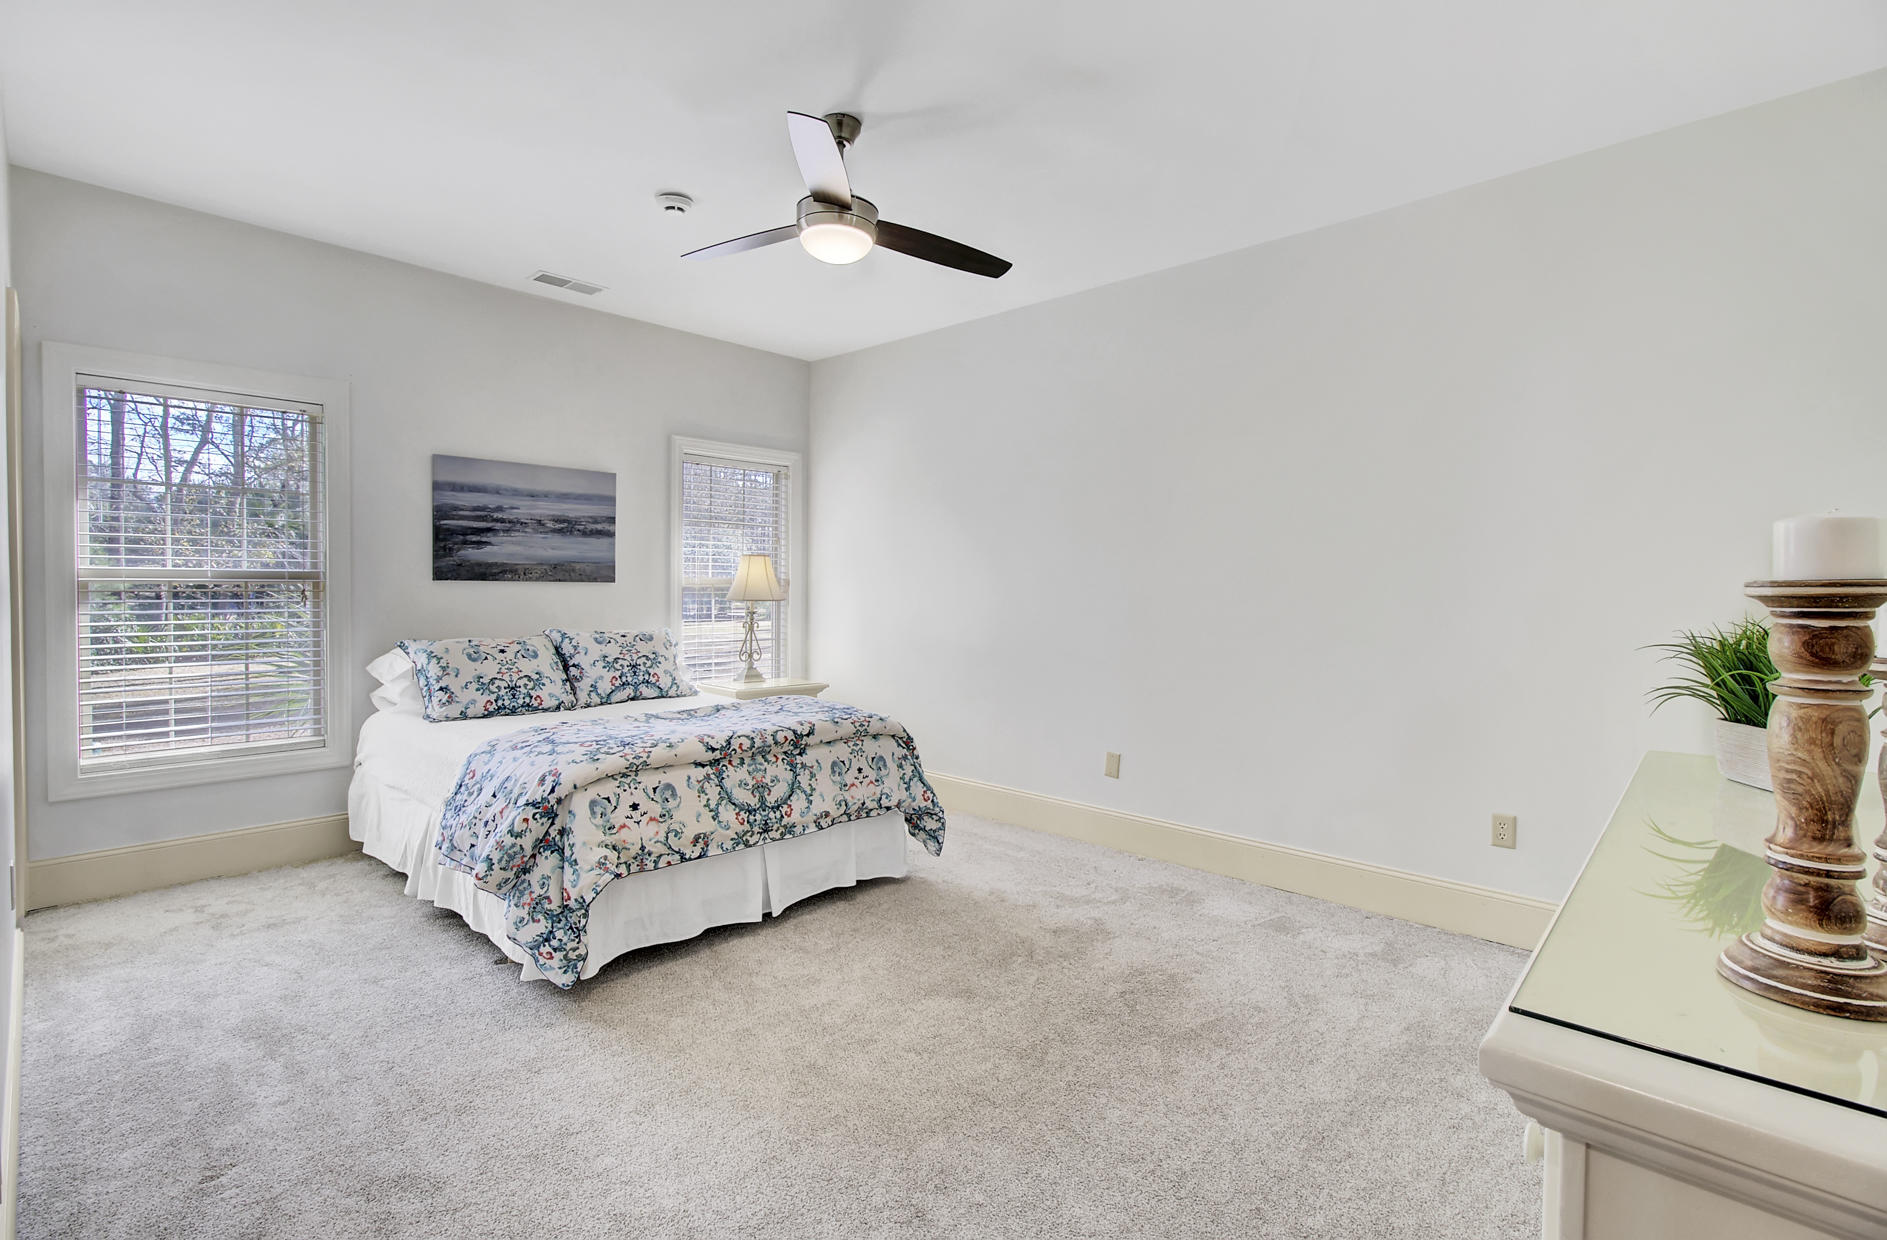 Dunes West Homes For Sale - 4123 Colonel Vanderhorst, Mount Pleasant, SC - 8